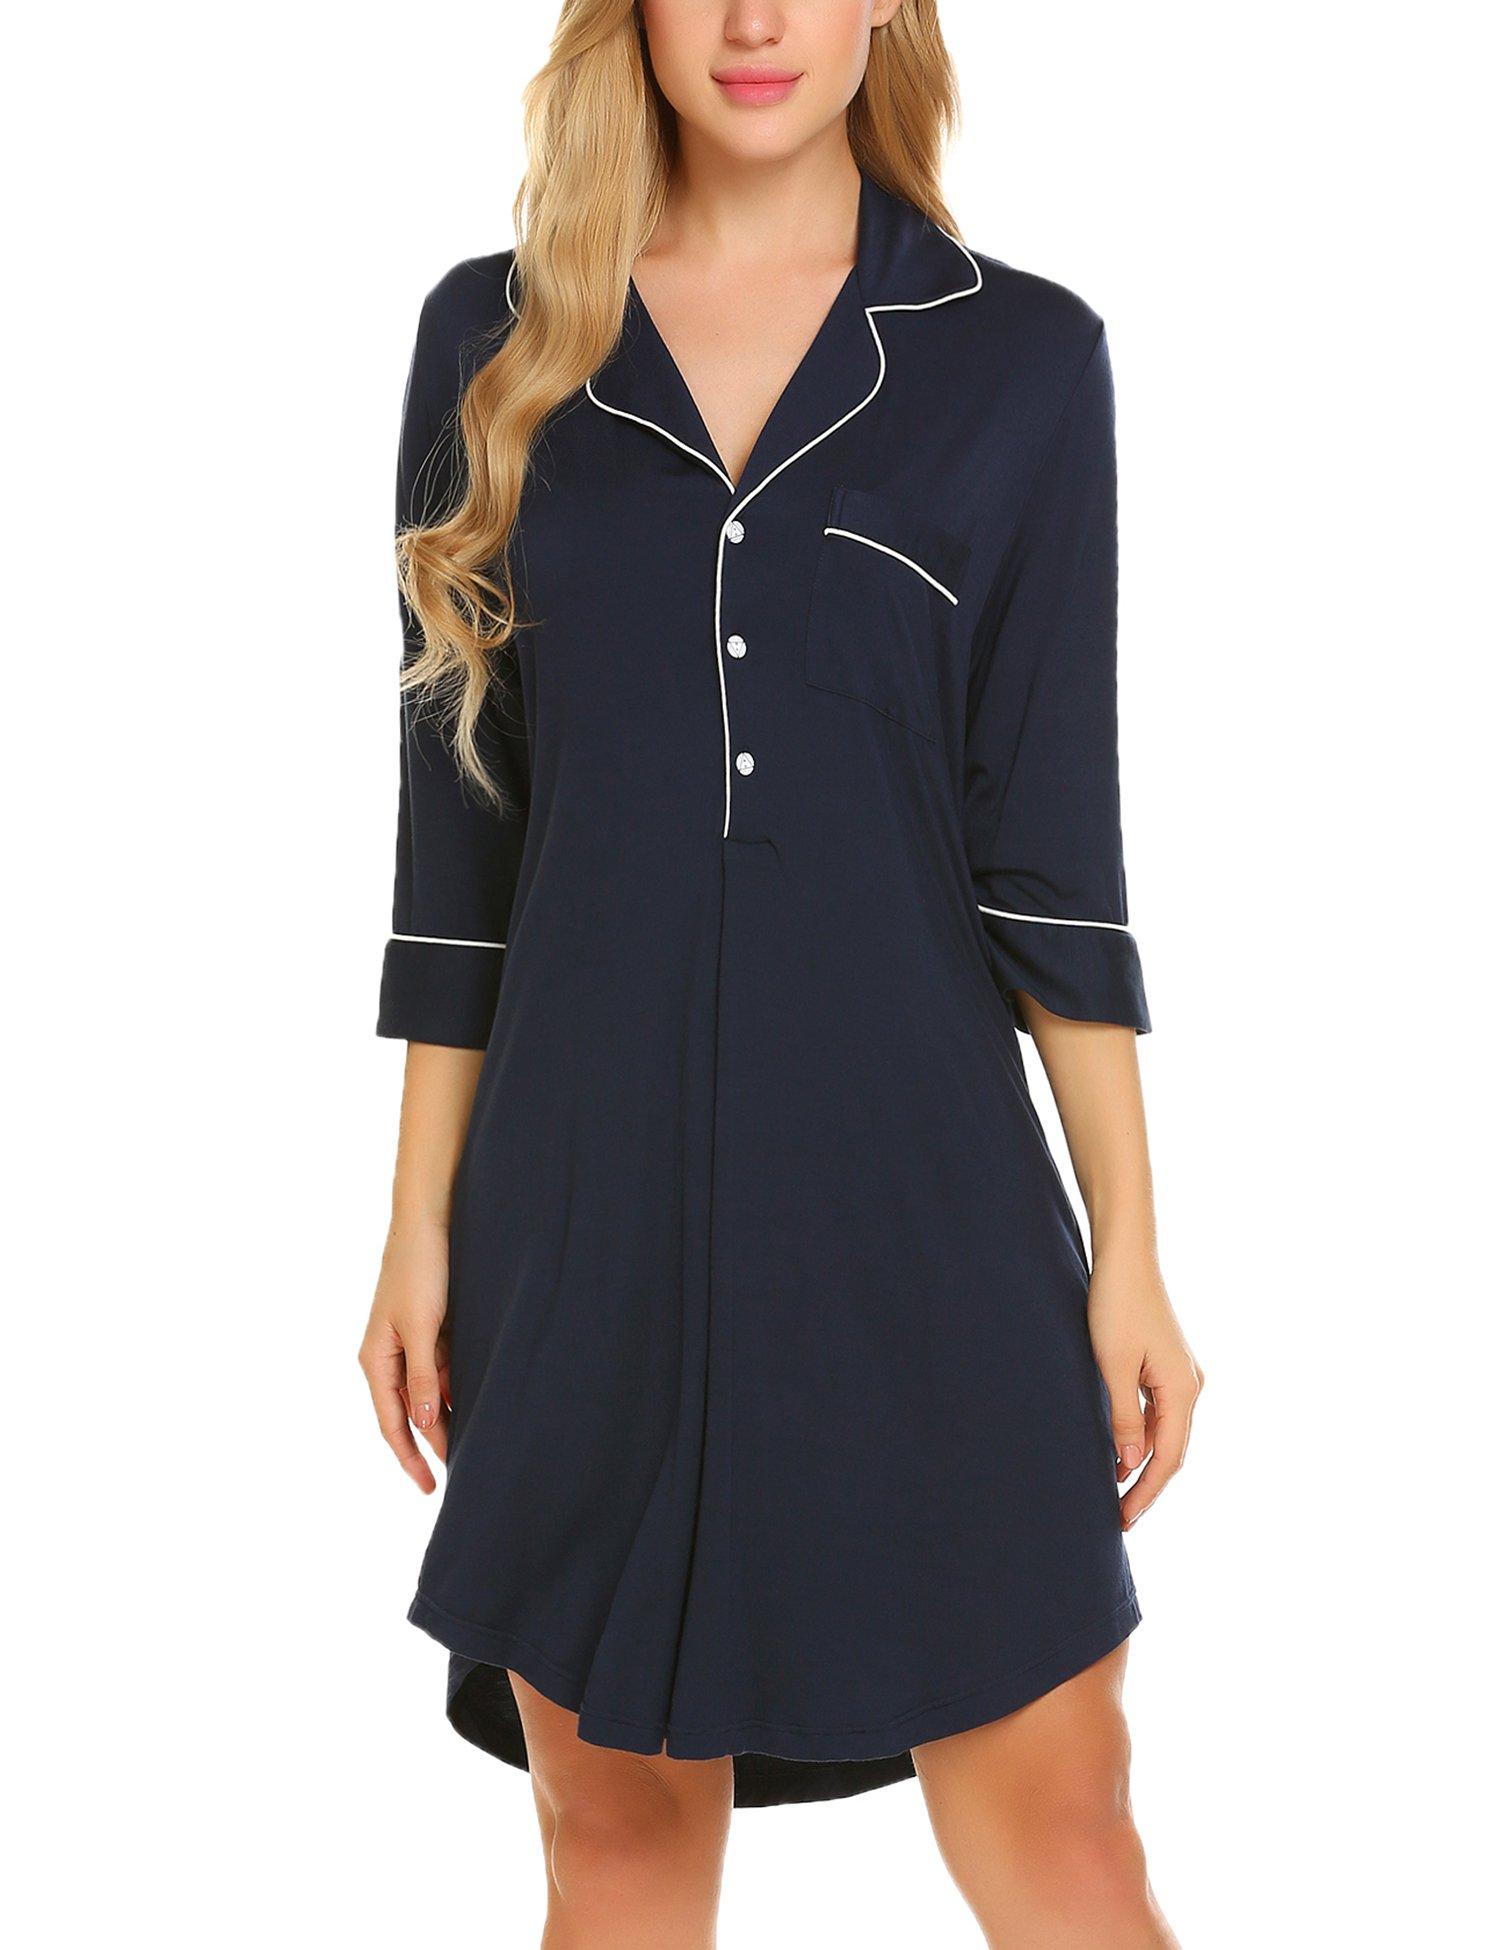 Ekouaer Boyfriend Style Sexy Cotton Nightgown Sleep Shirt For Women,Navy Blue(3/4 Sleeve),Small